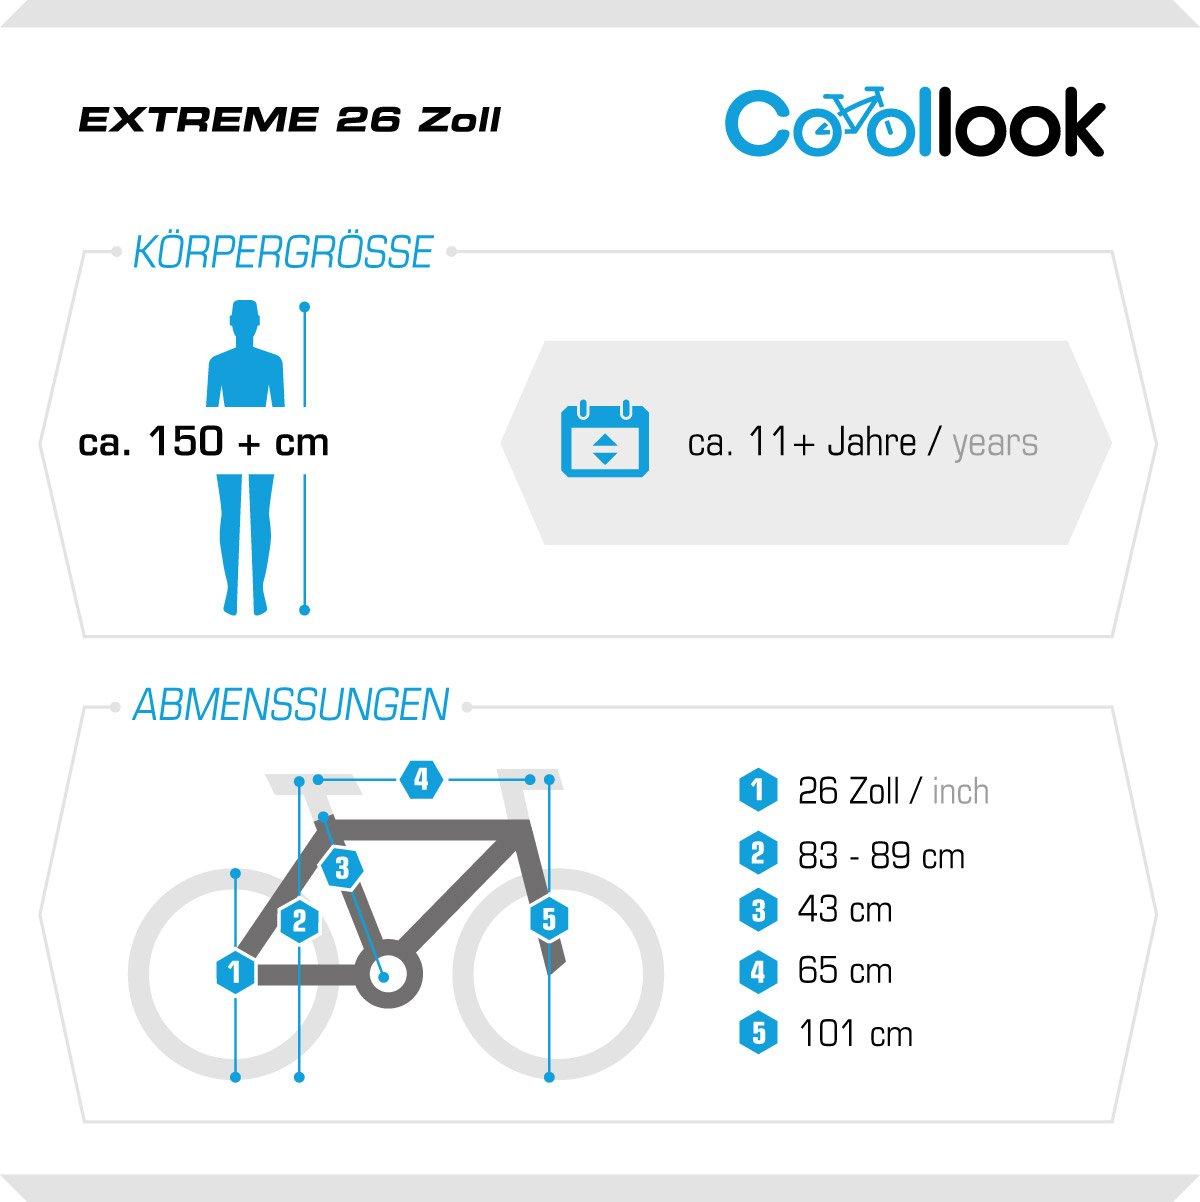 26 Zoll Multibrand Extreme Fahrrad Fully Full Suspension Mountainbike Mtb Rahmen 43 Cm Vorderer Und Hinterer Kotflügel 18 Gang Schaltung Mit